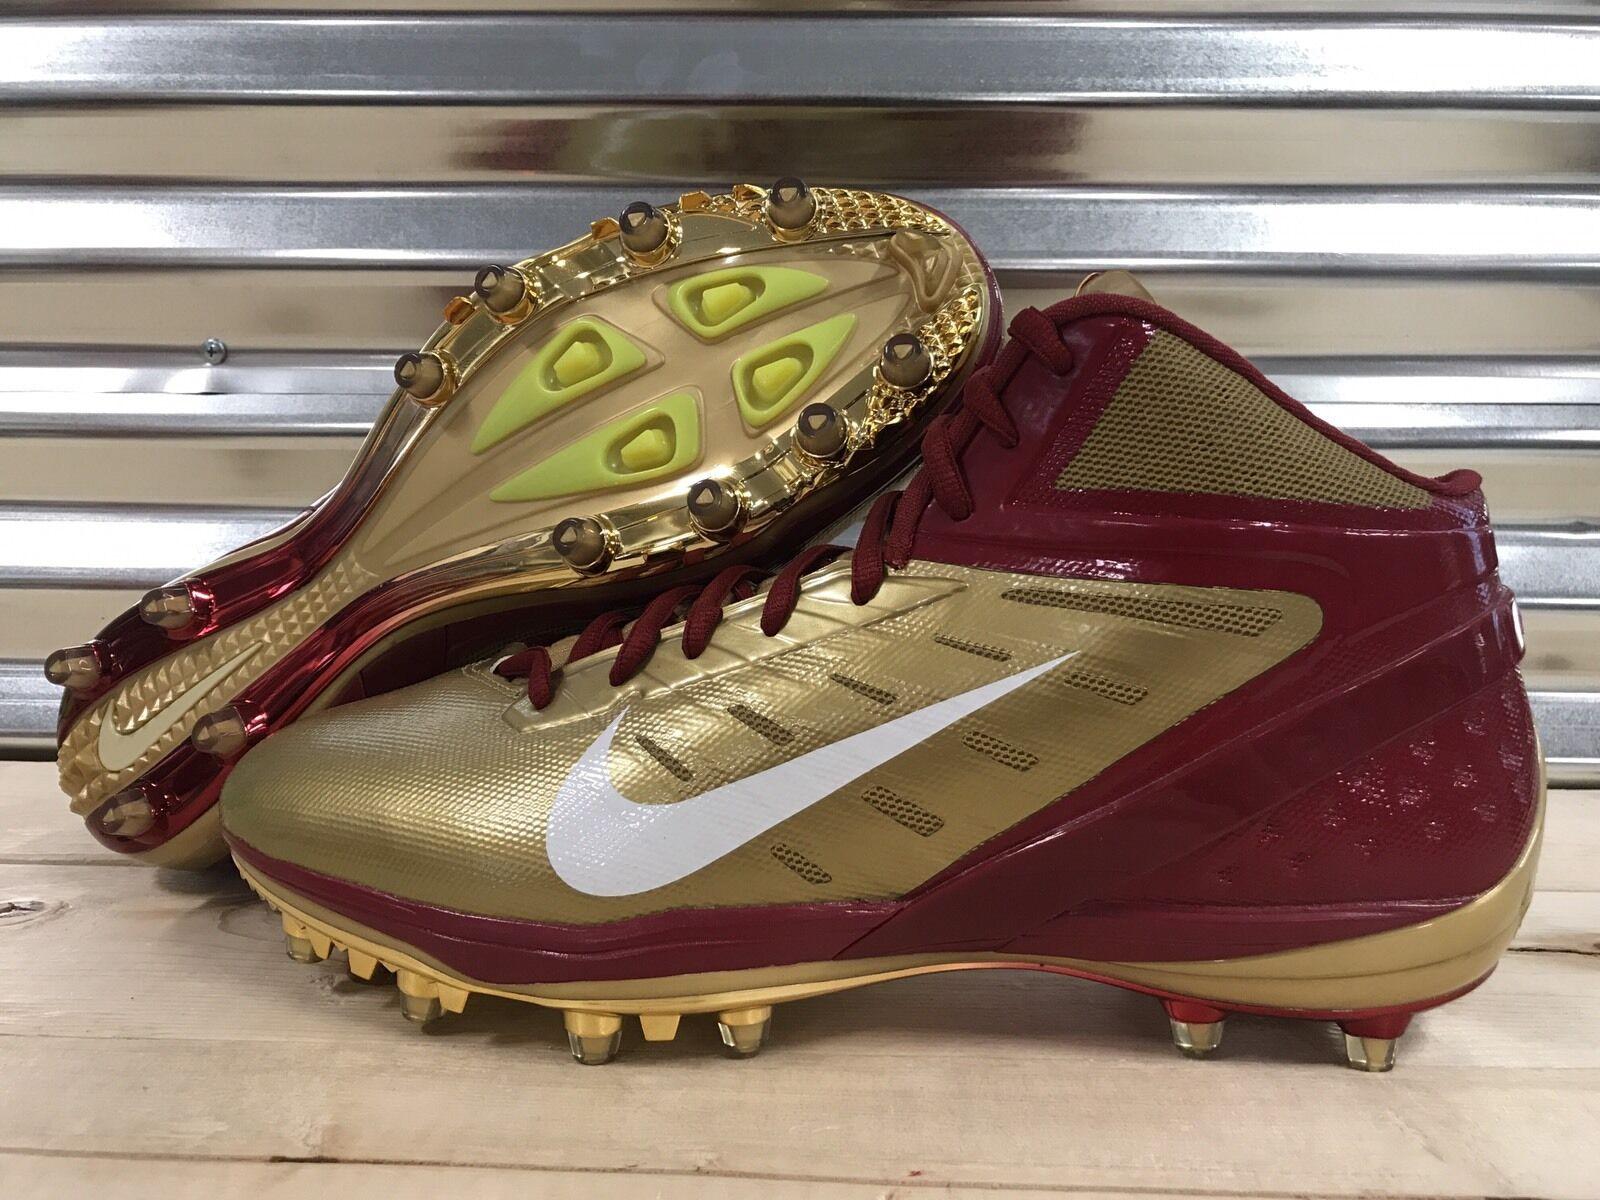 best service 68c86 b6ccc Nike Alpha Talon Elite Florida State Seminoles Football Cleats FSU Sample  SZ 14